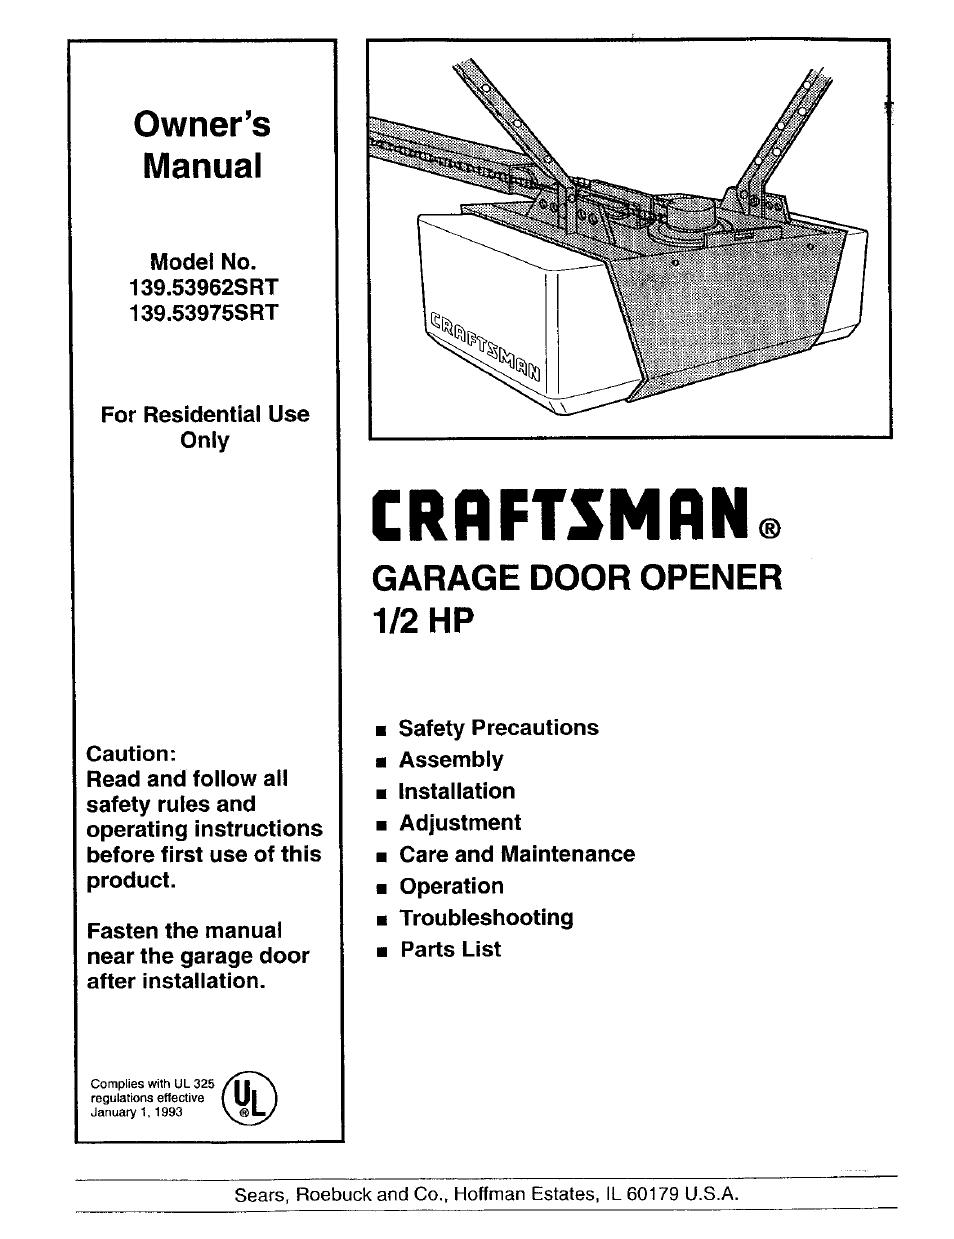 medium resolution of craftsman 139 53975srt user manual 40 pages also for 139 53962 srt genie garage door